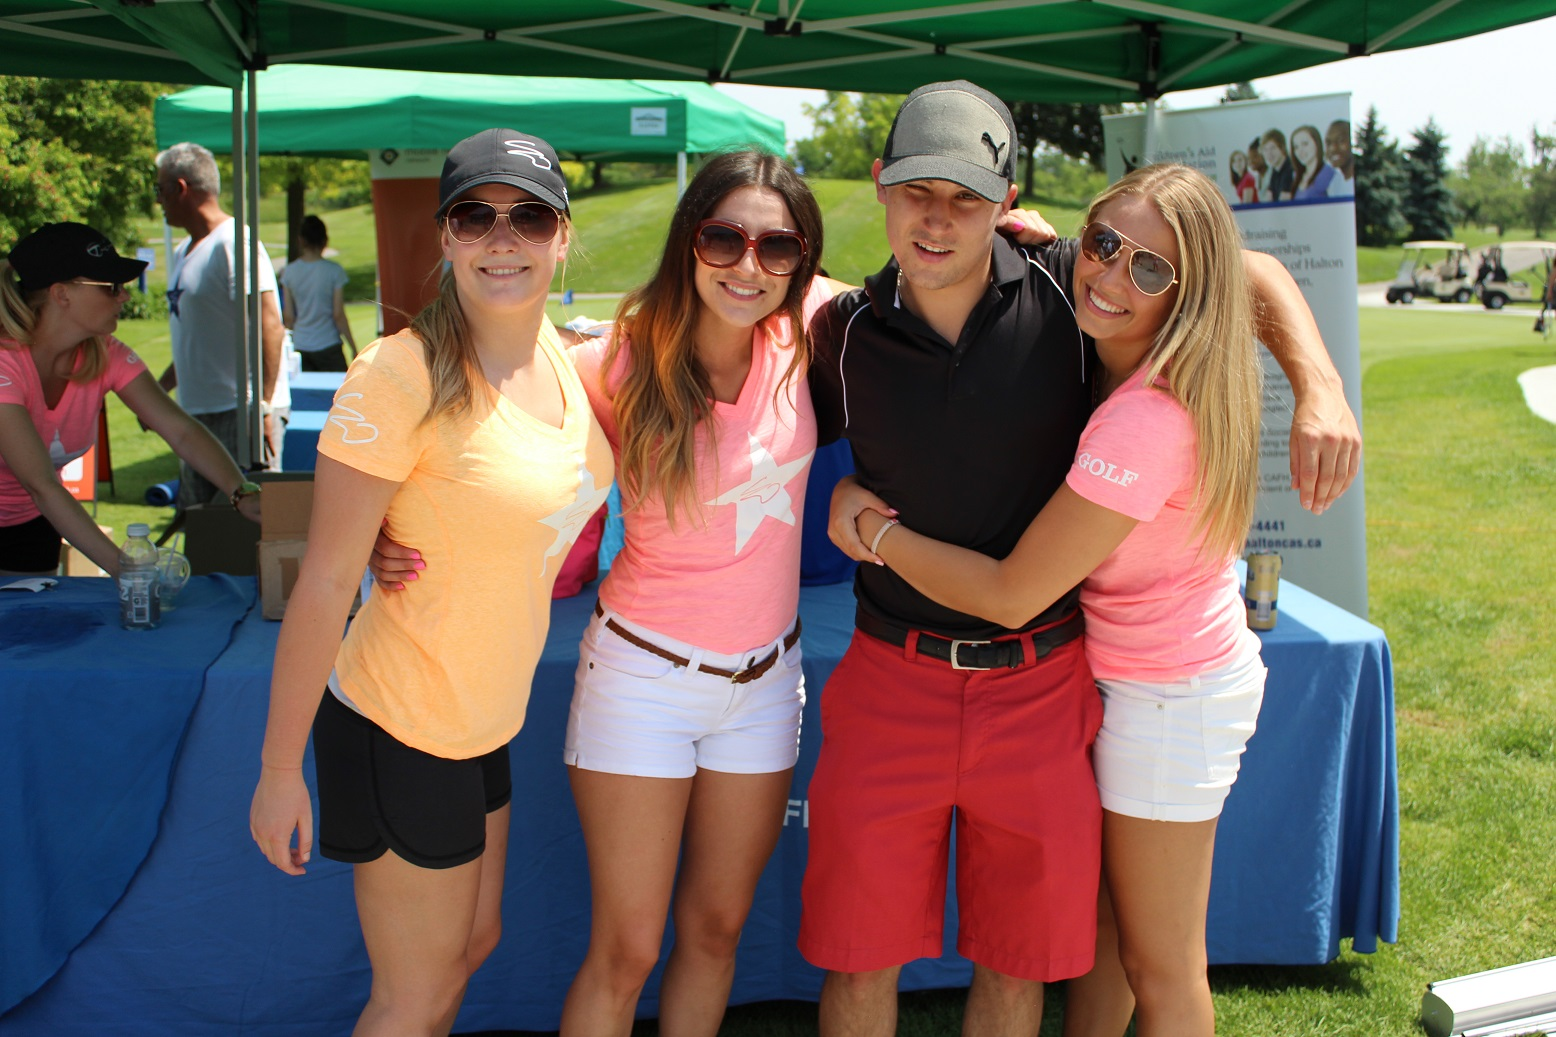 EddieO's Golf guests 22.jpg